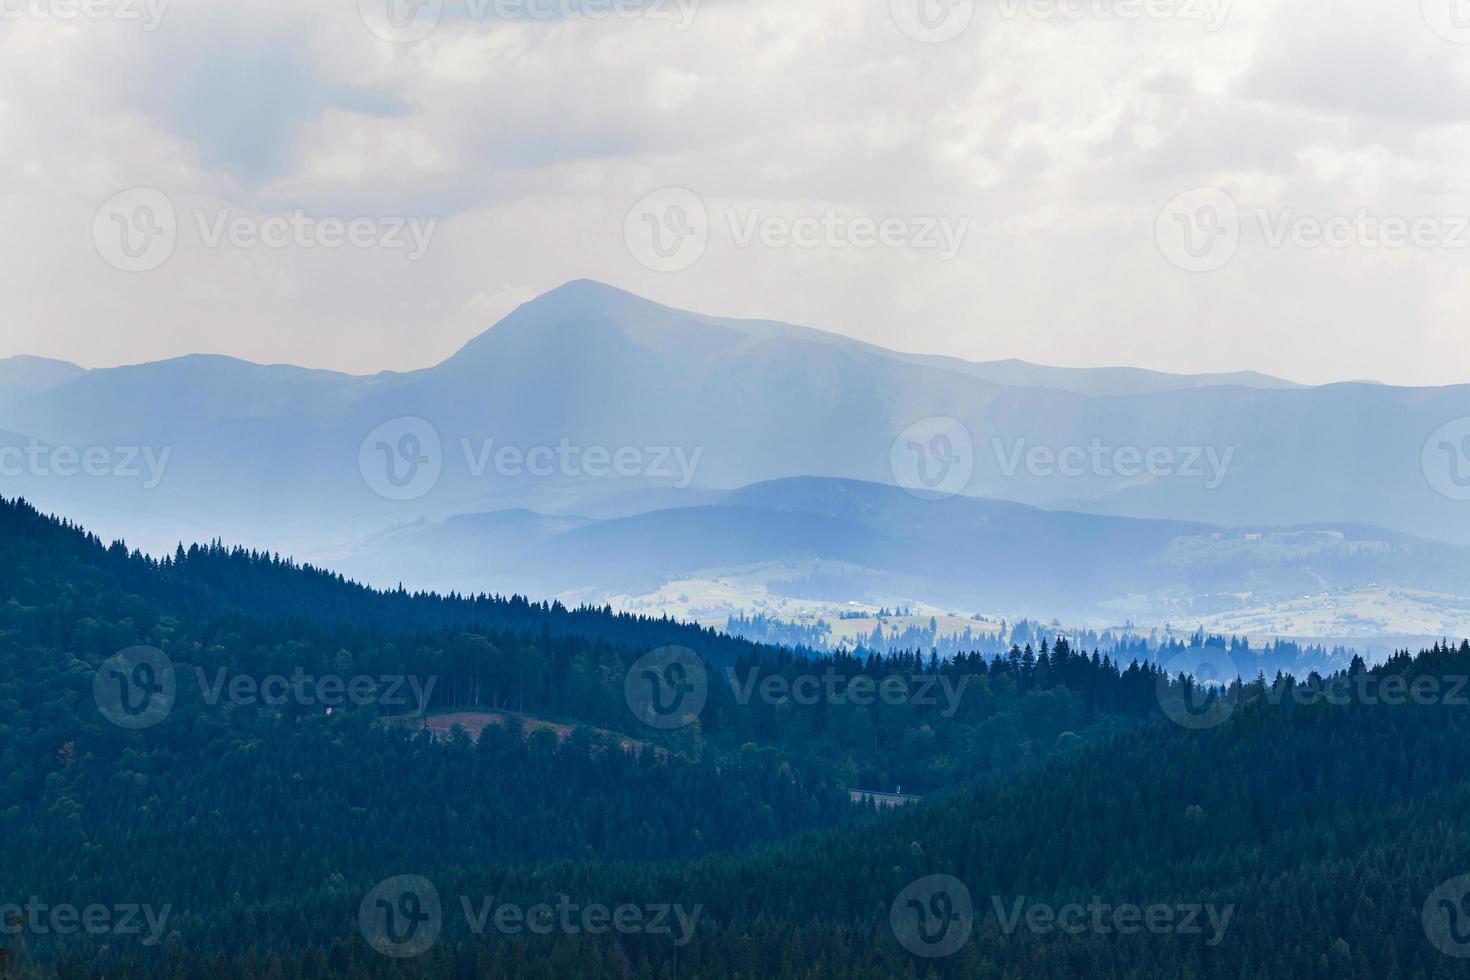 montenegrinska åsen i karpaterna foto